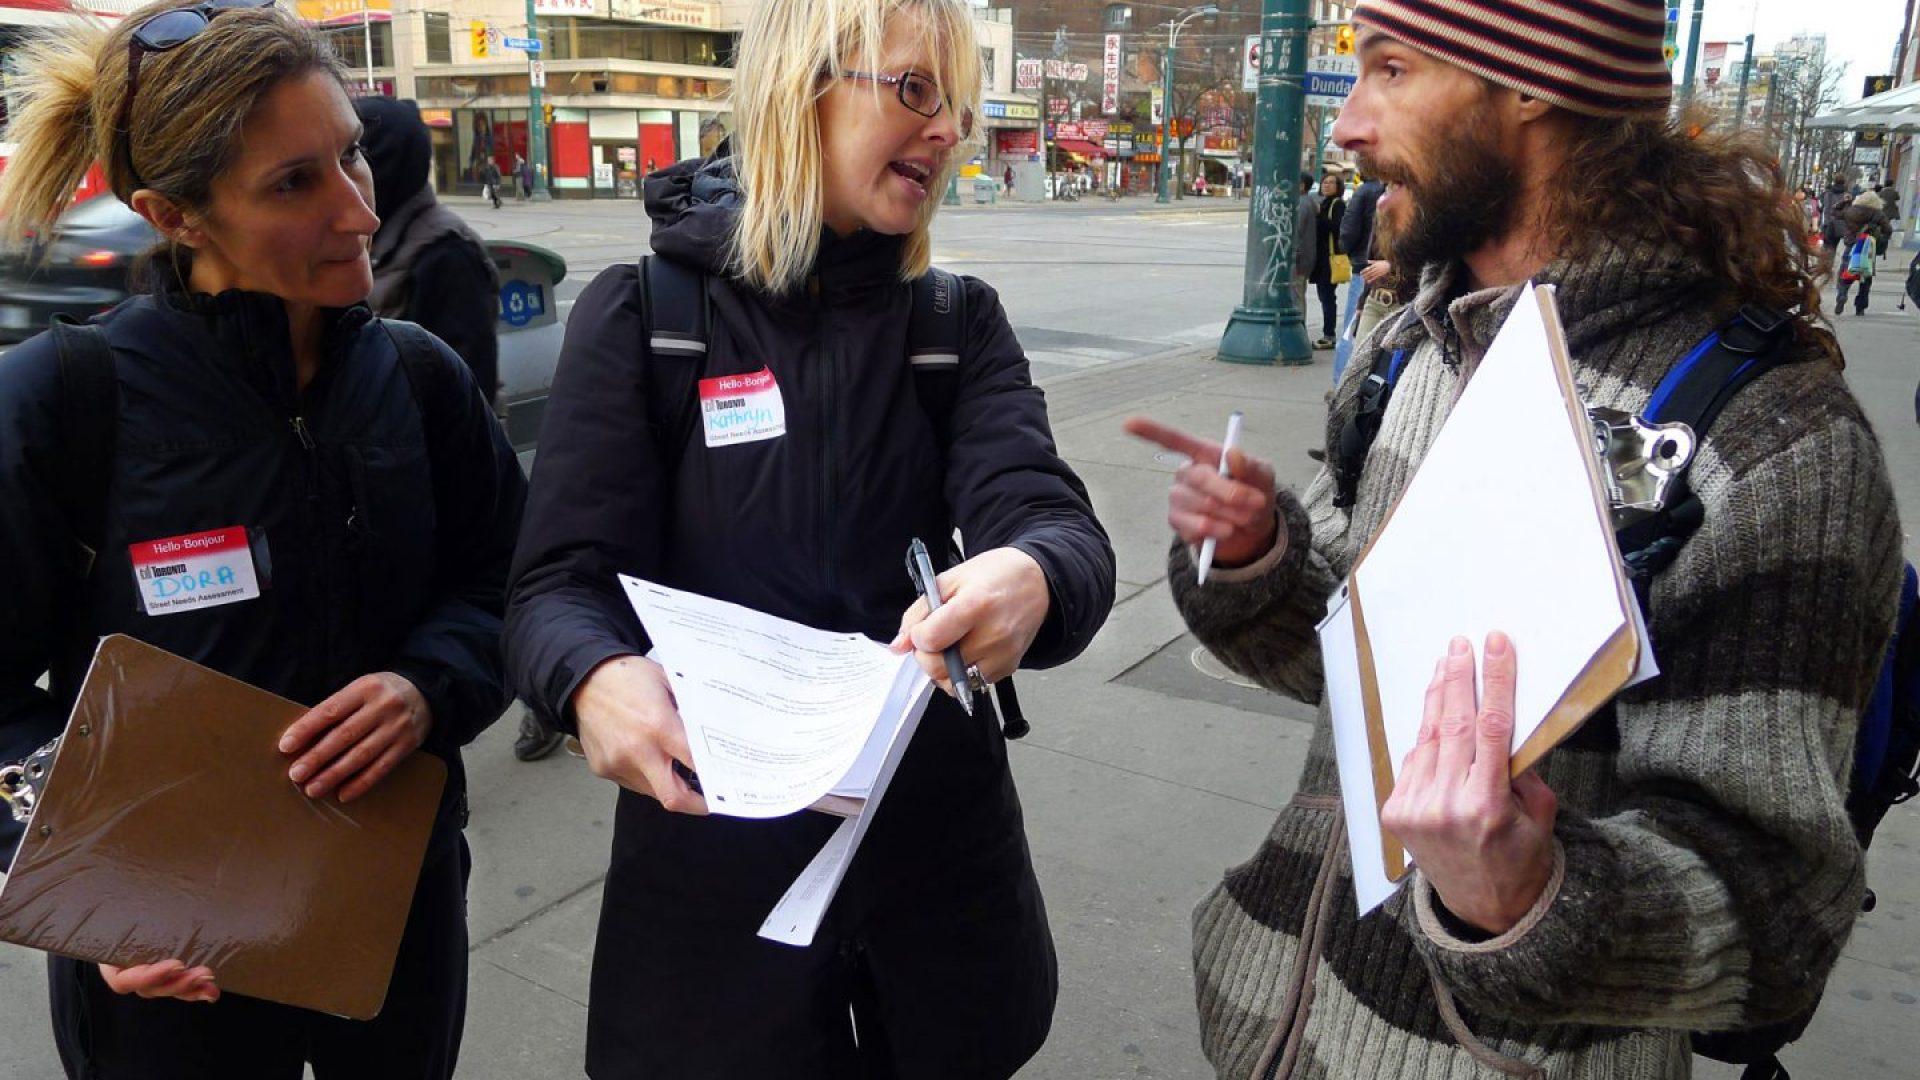 Volunteers in the street needs assessment